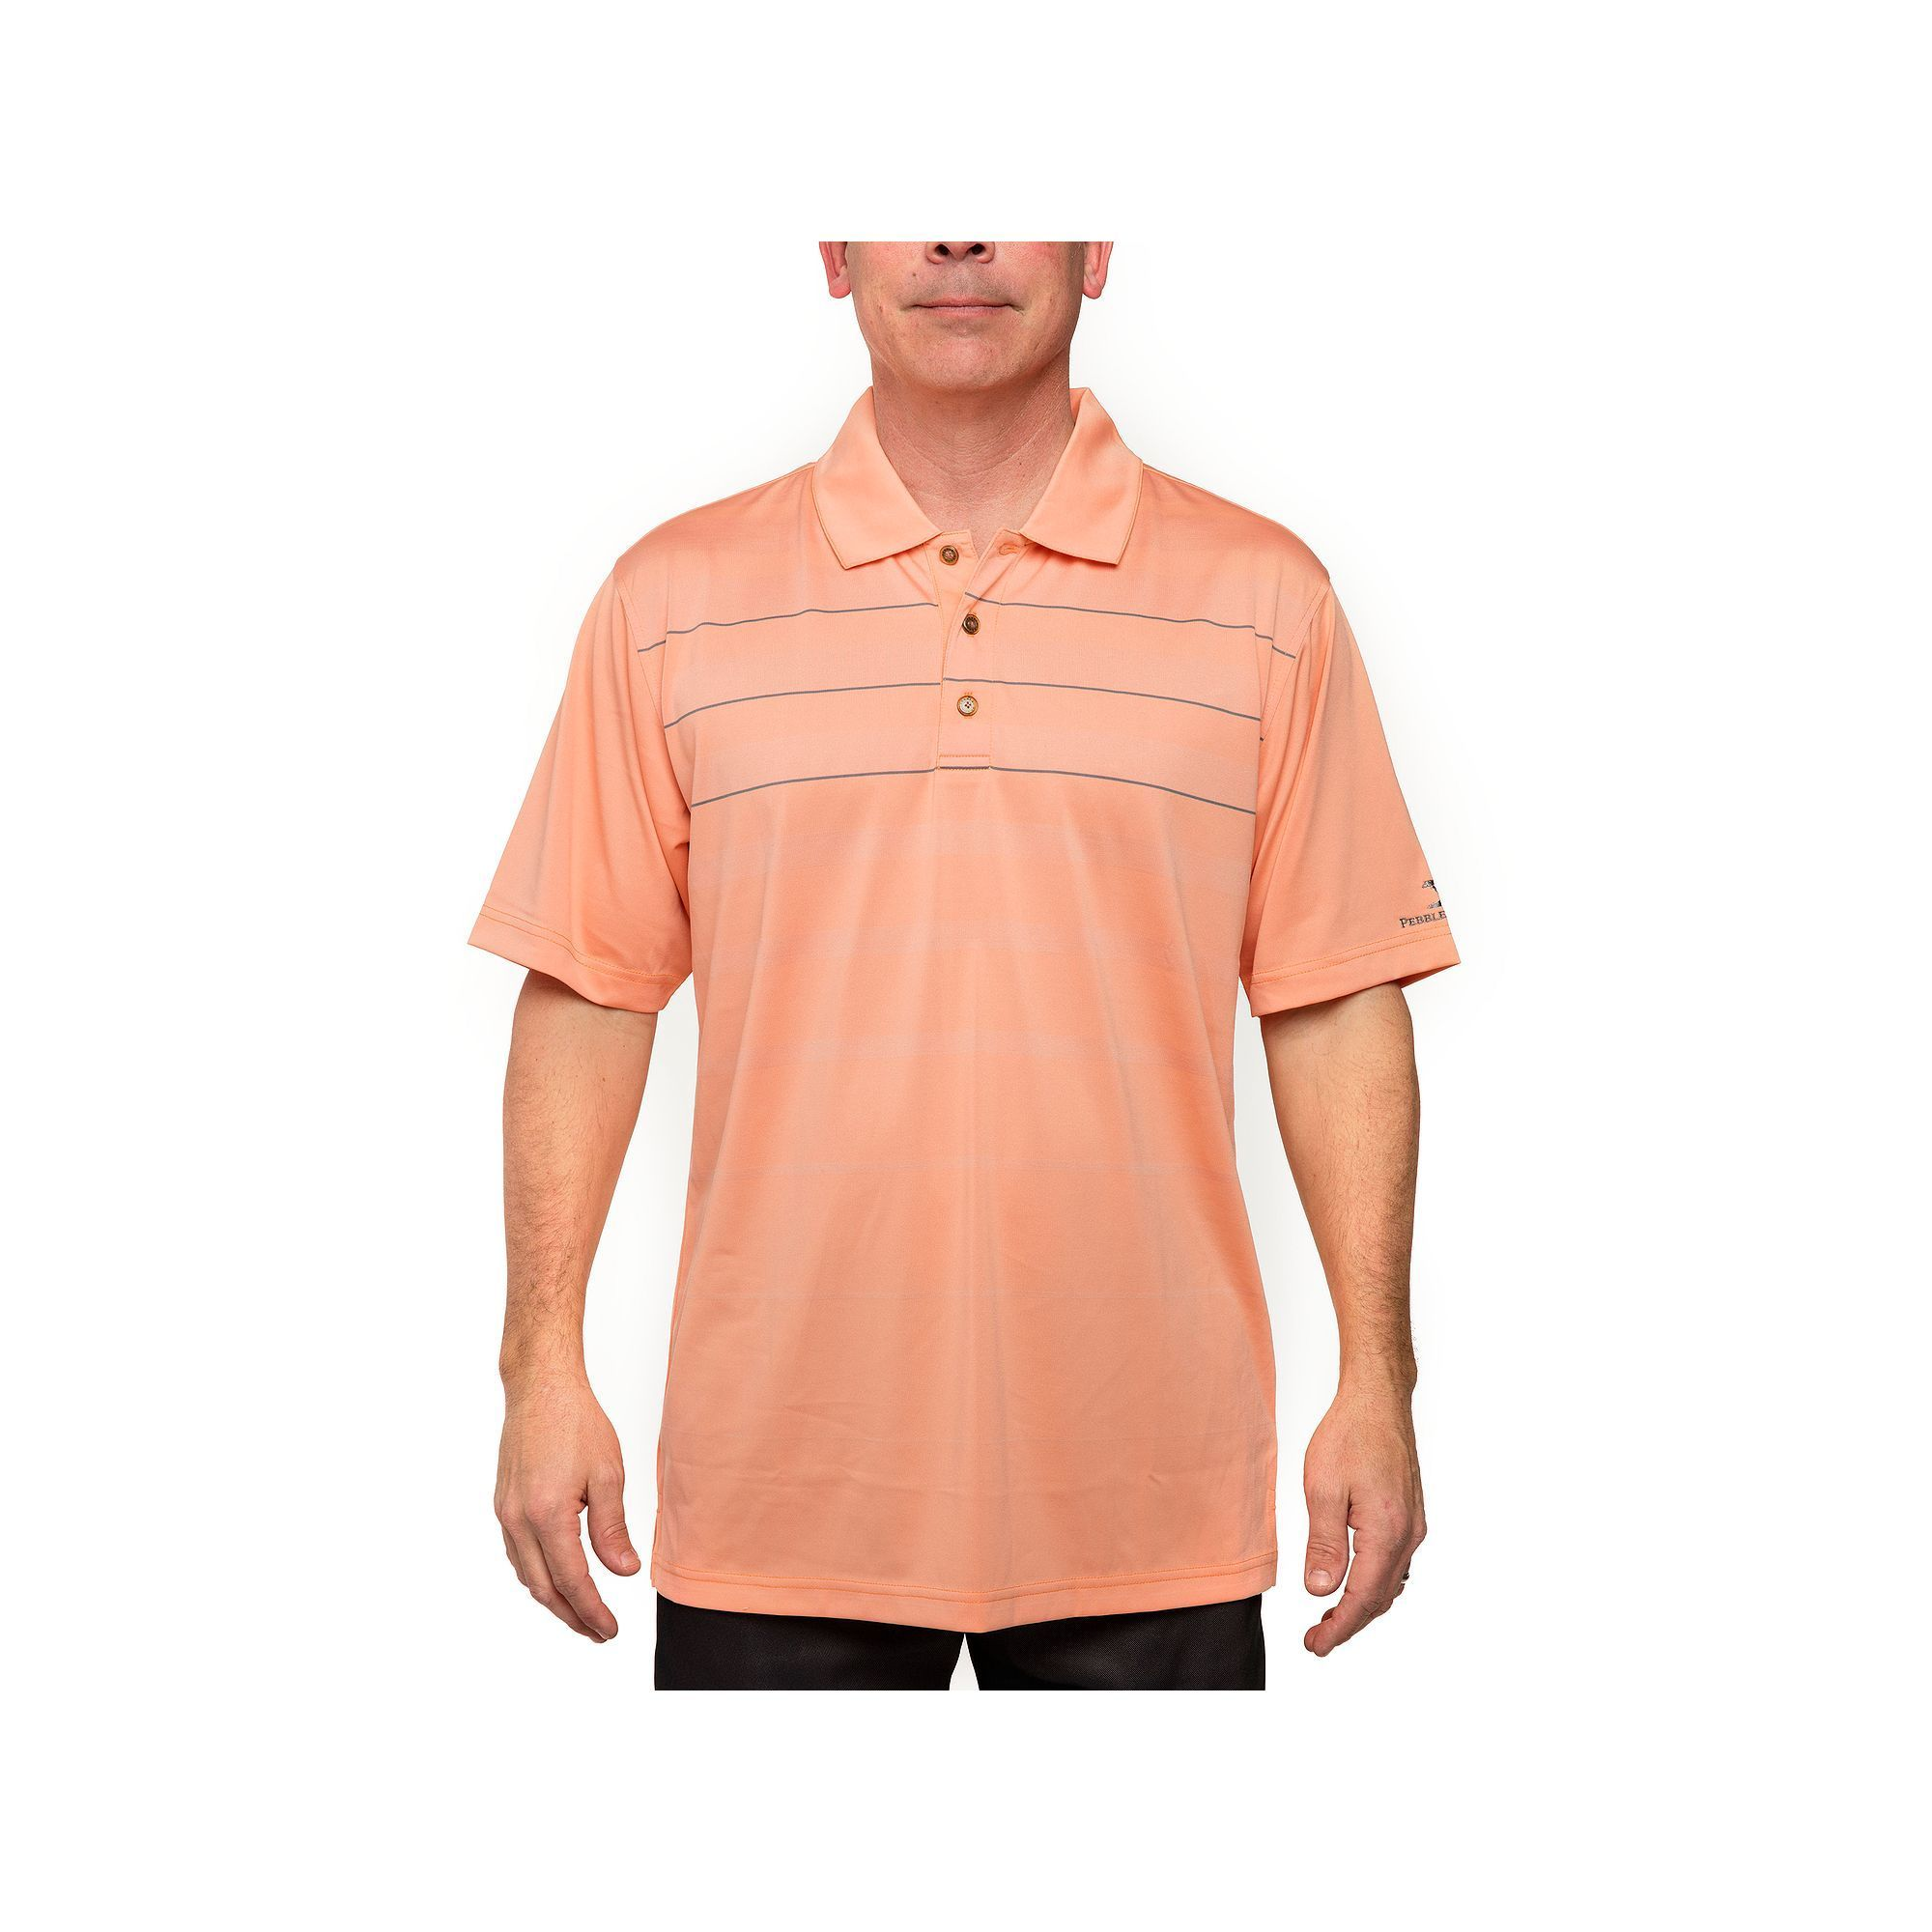 441c5e9a42 Men's Pebble Beach Classic-Fit Gradient-Striped Performance Golf Polo, Drk  Orange